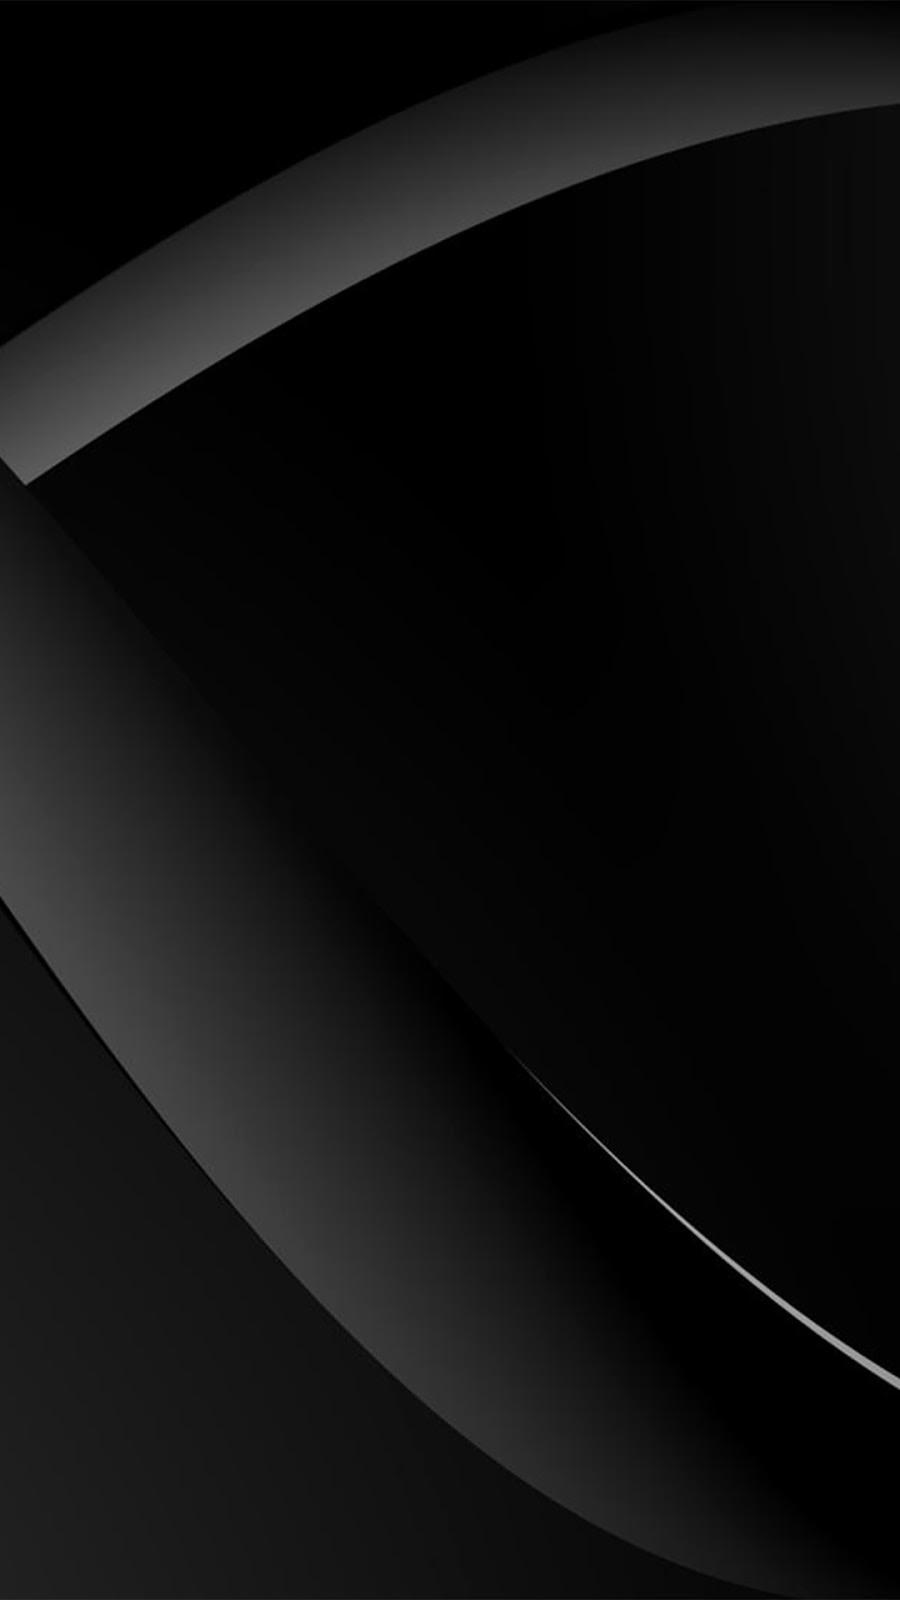 Nokia Wallpapers And Themes WallpaperSafari